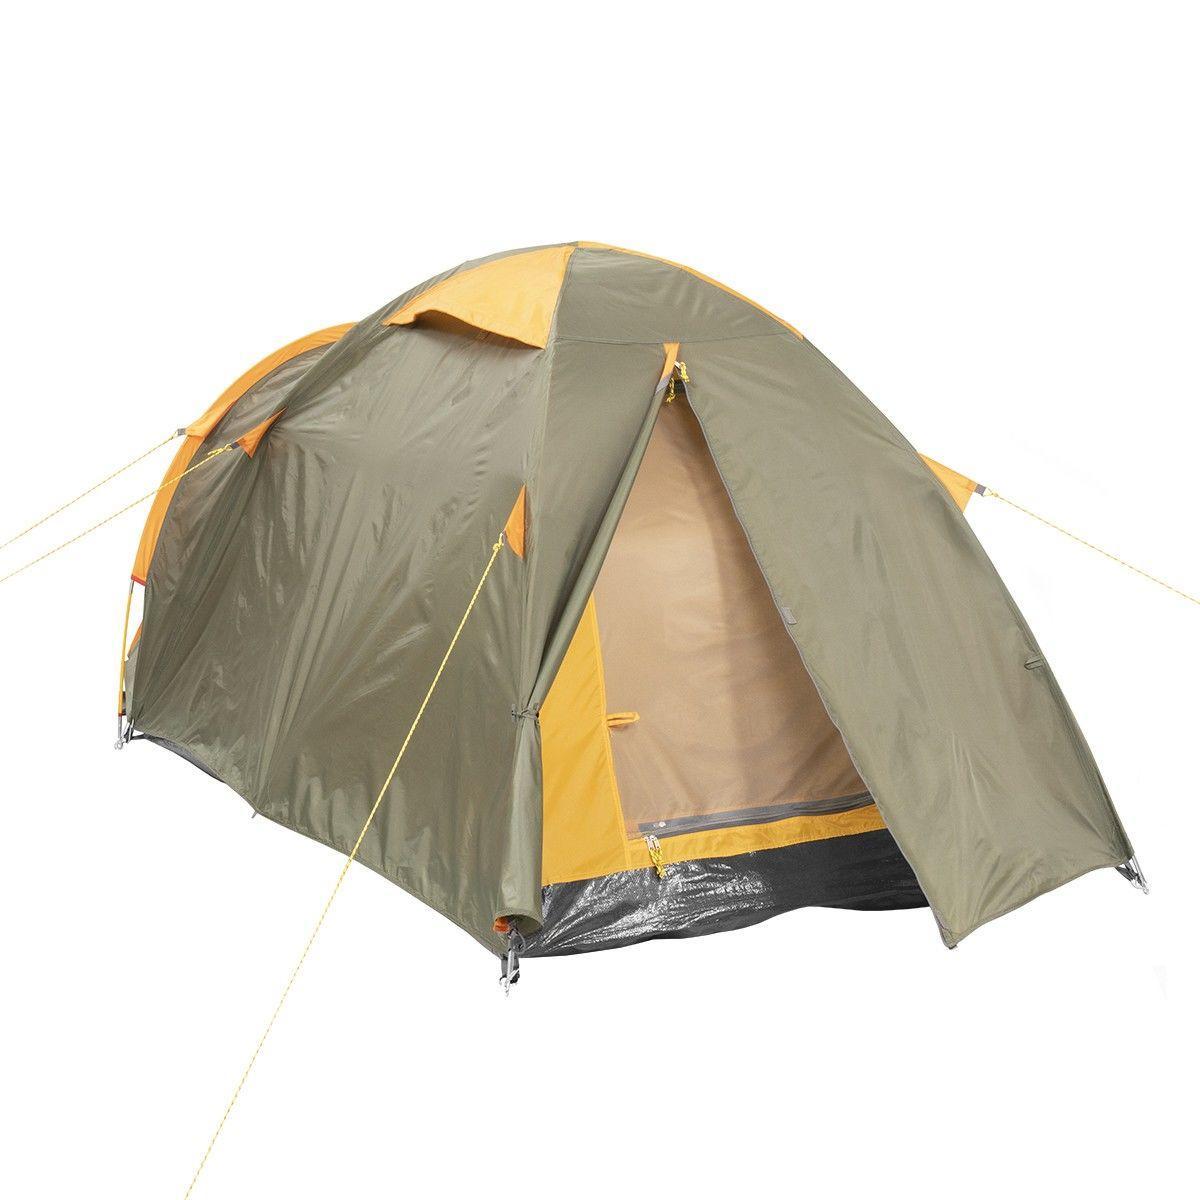 Палатка MUSSON-3 Helios зеленый-оранжевый HS-2366-3 GO - фото 5